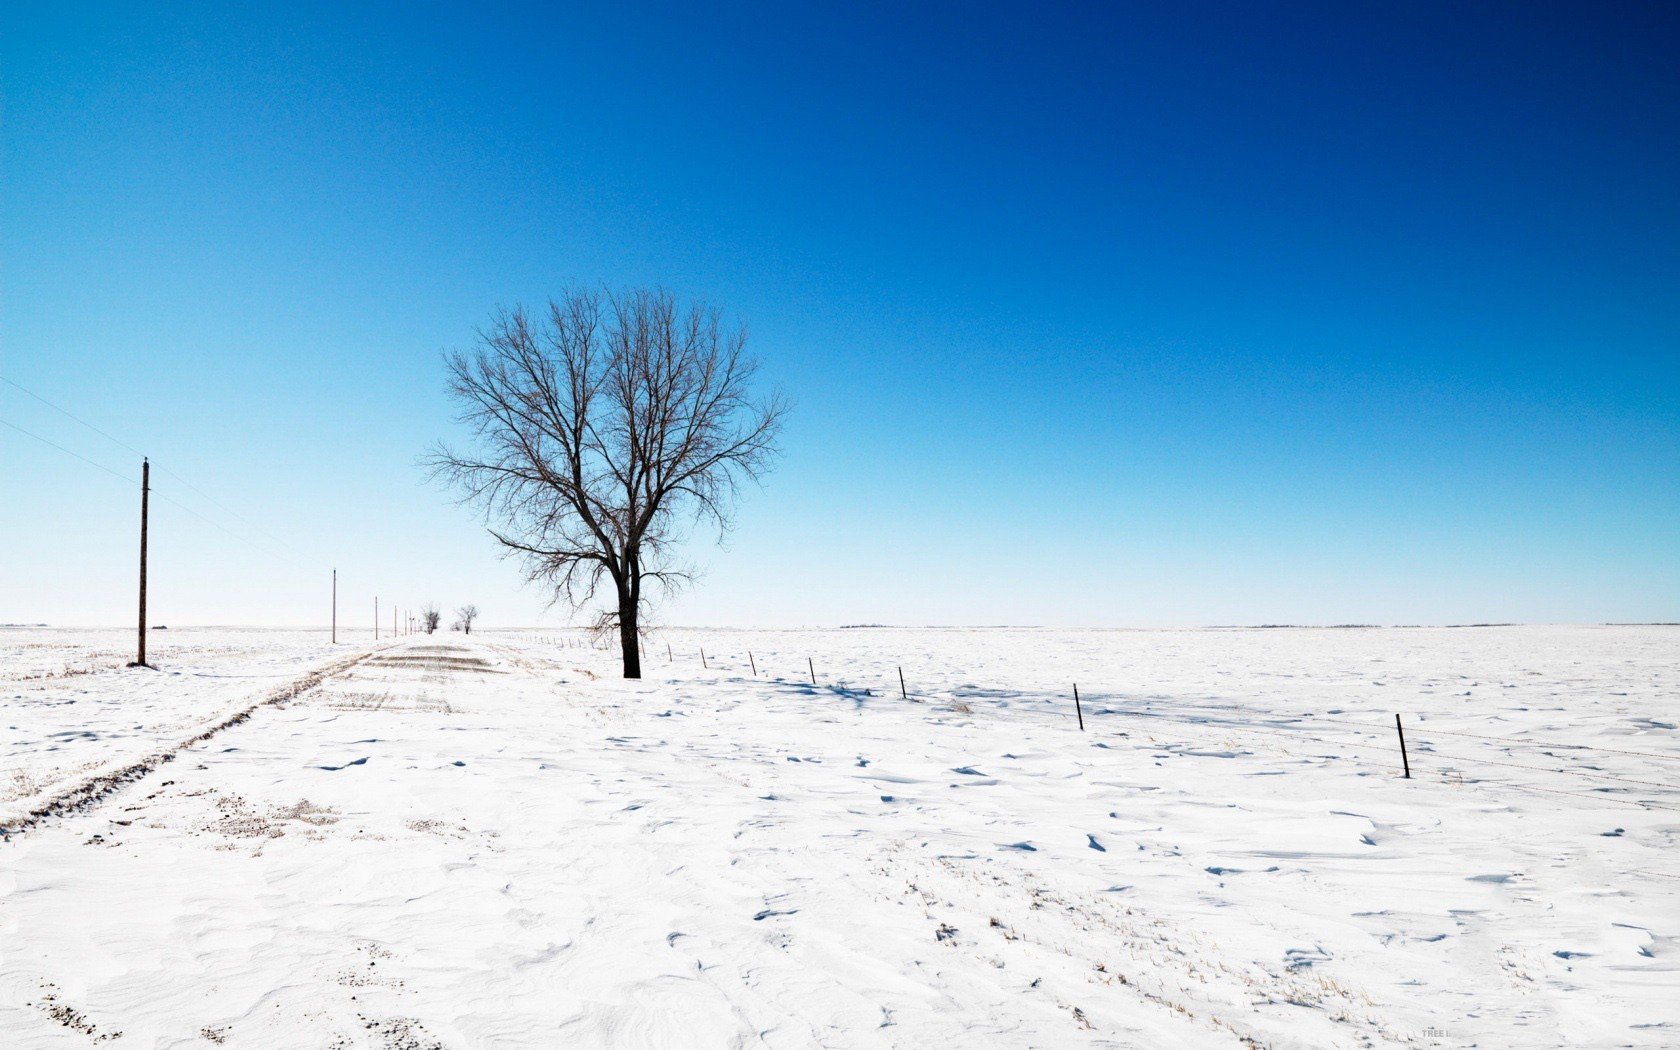 Paisajes con nieve - 1680x1050